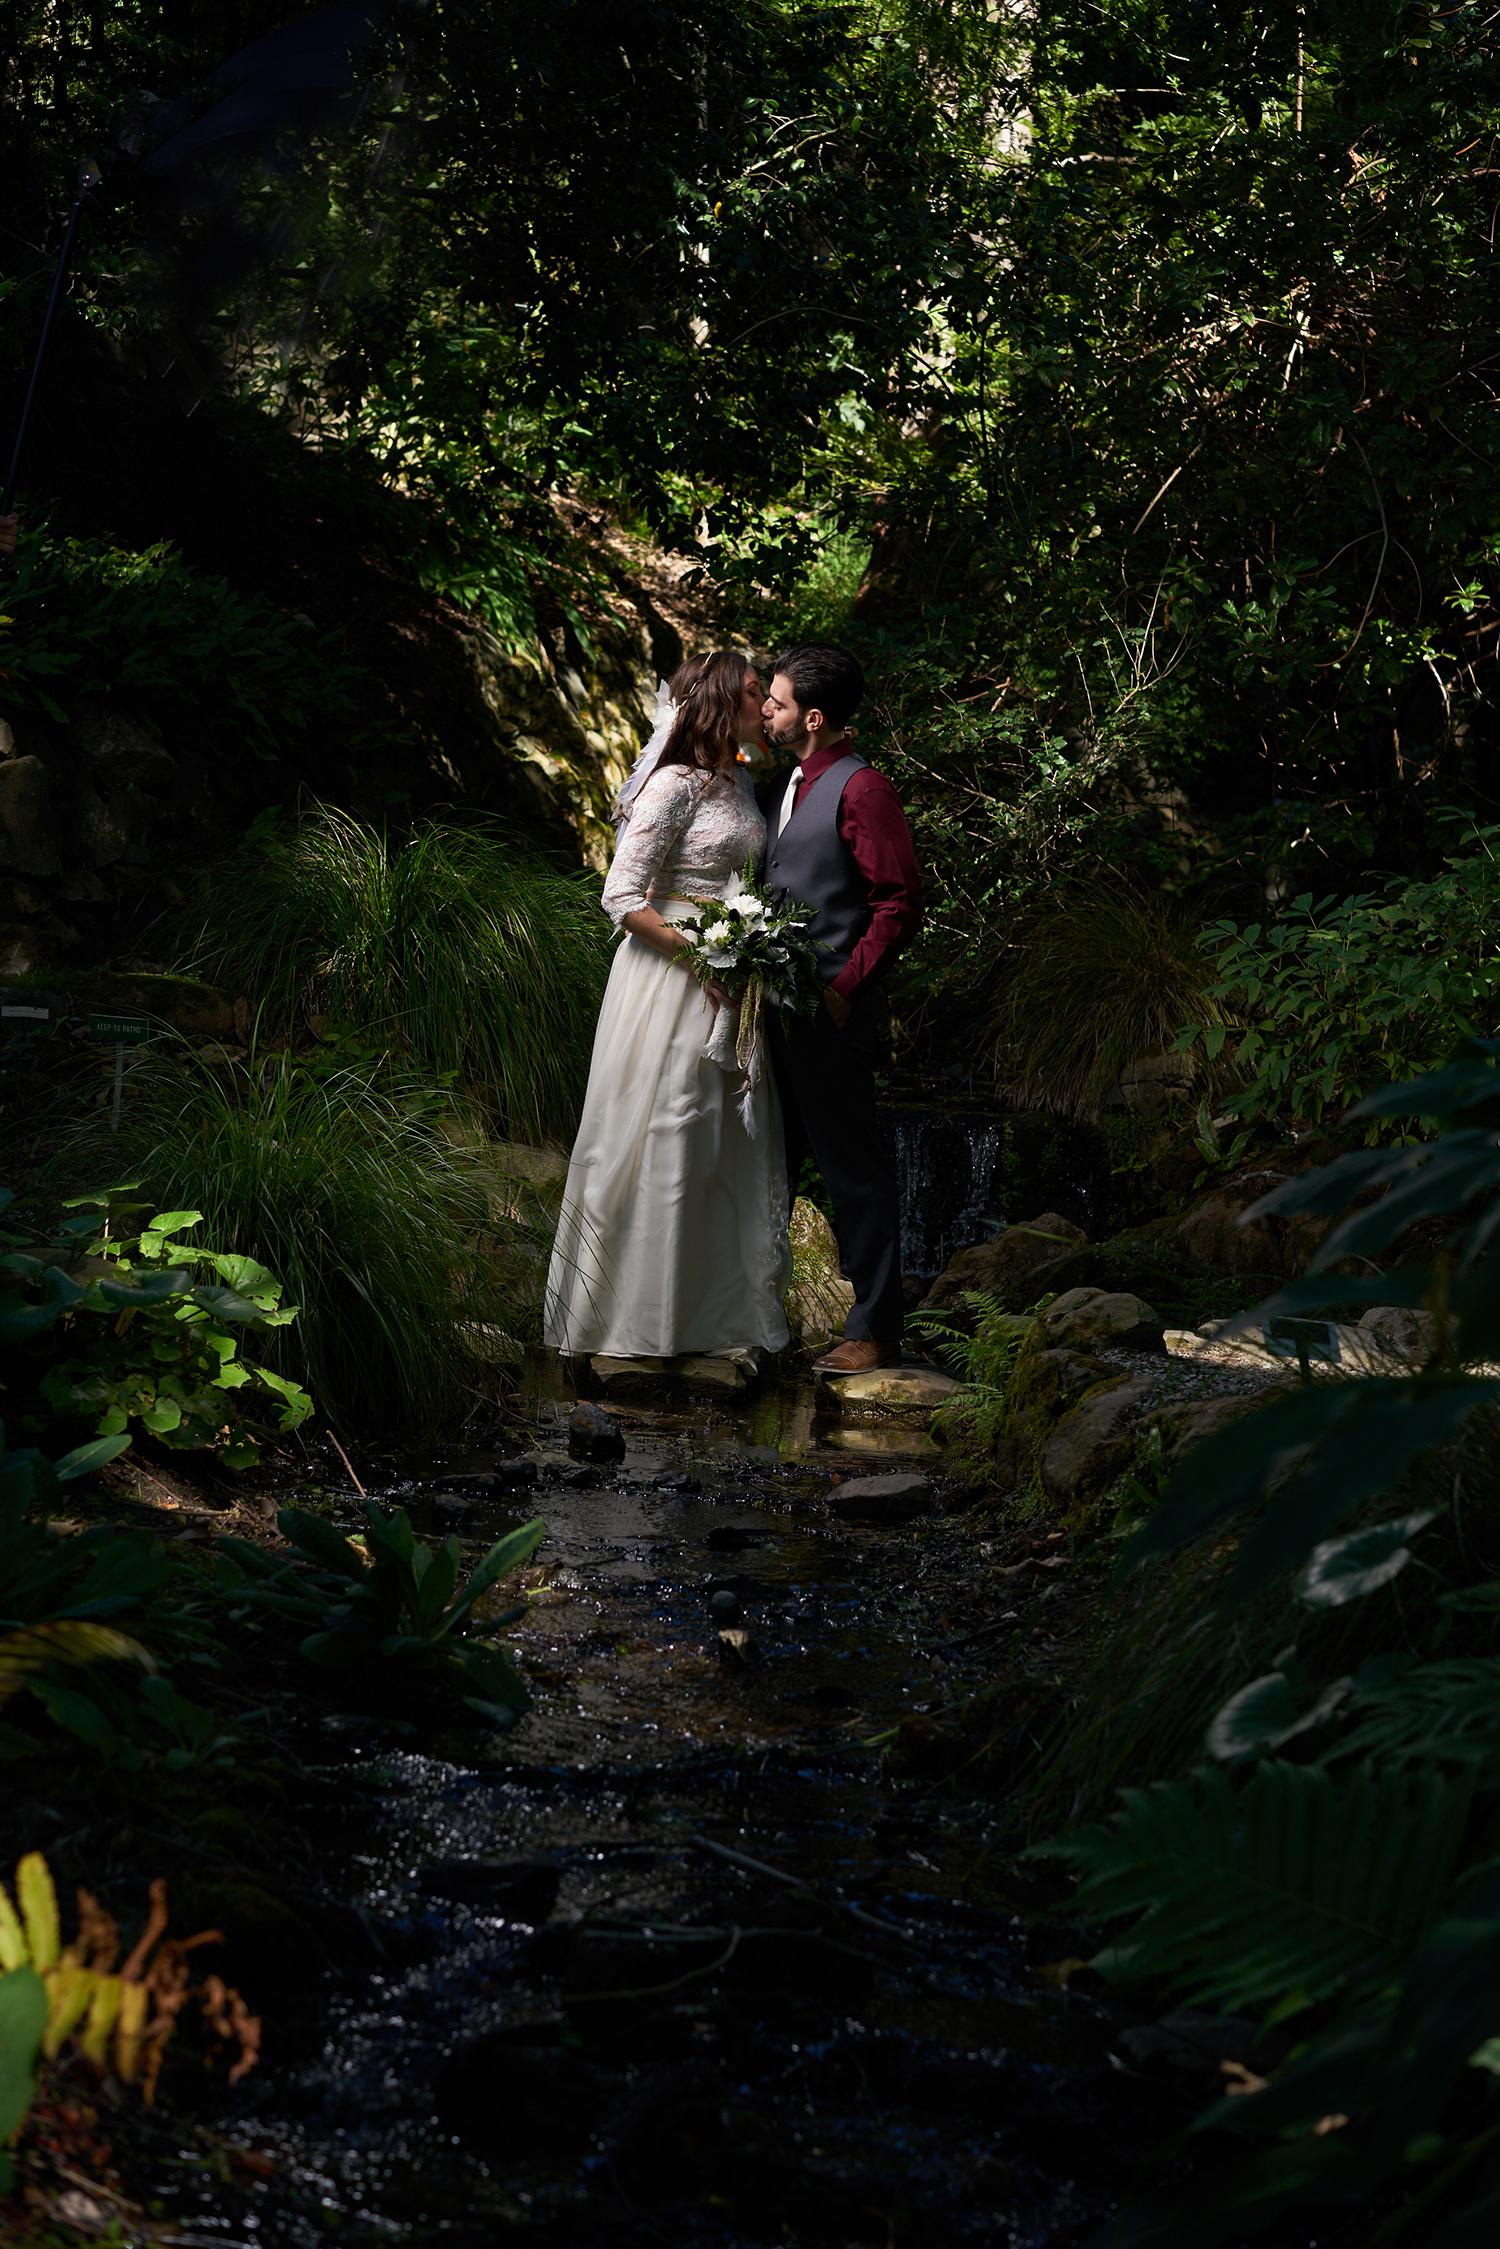 100717_Lenora_Jesse0421-weddingdress-bride-weddingphotography-best-weddingphotographer-bridal-groom-wedding-engagementring-proposal-brides-diamondring-sonyalpha-sony-sonya7rii-sanfrancisco-sf-bayarea-photographer-profoto-berkeley-botanical-garden.jpg